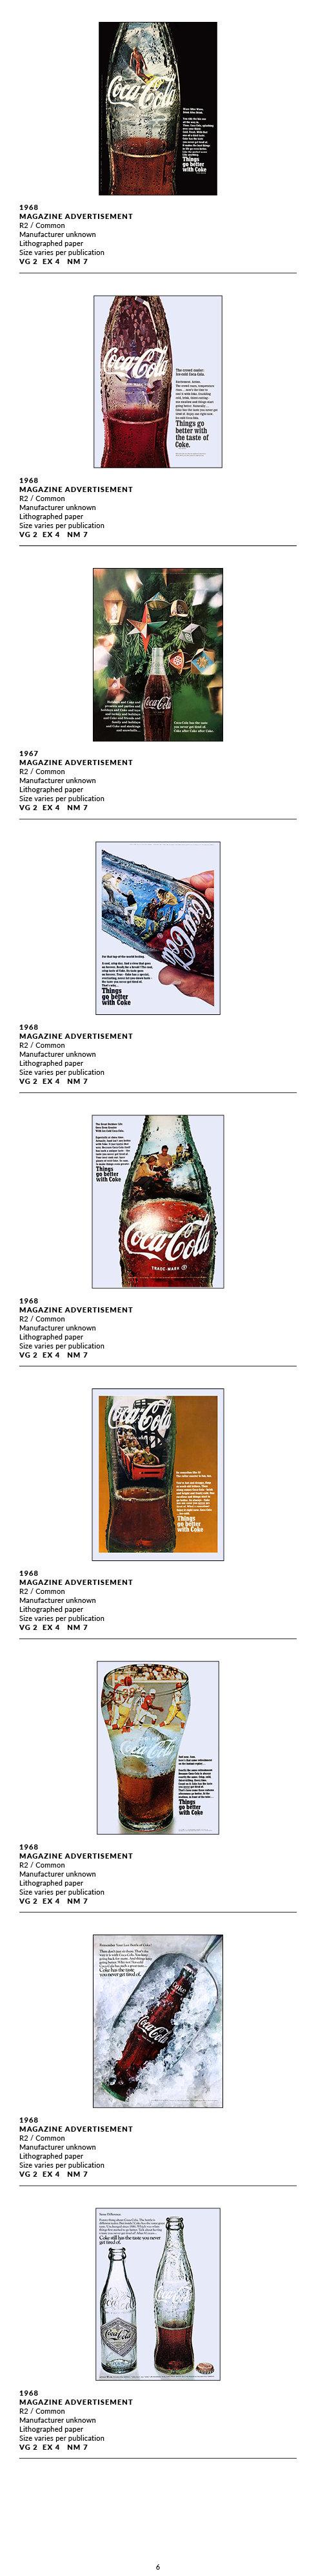 Desktop 1965-69 Ads Master6.jpg